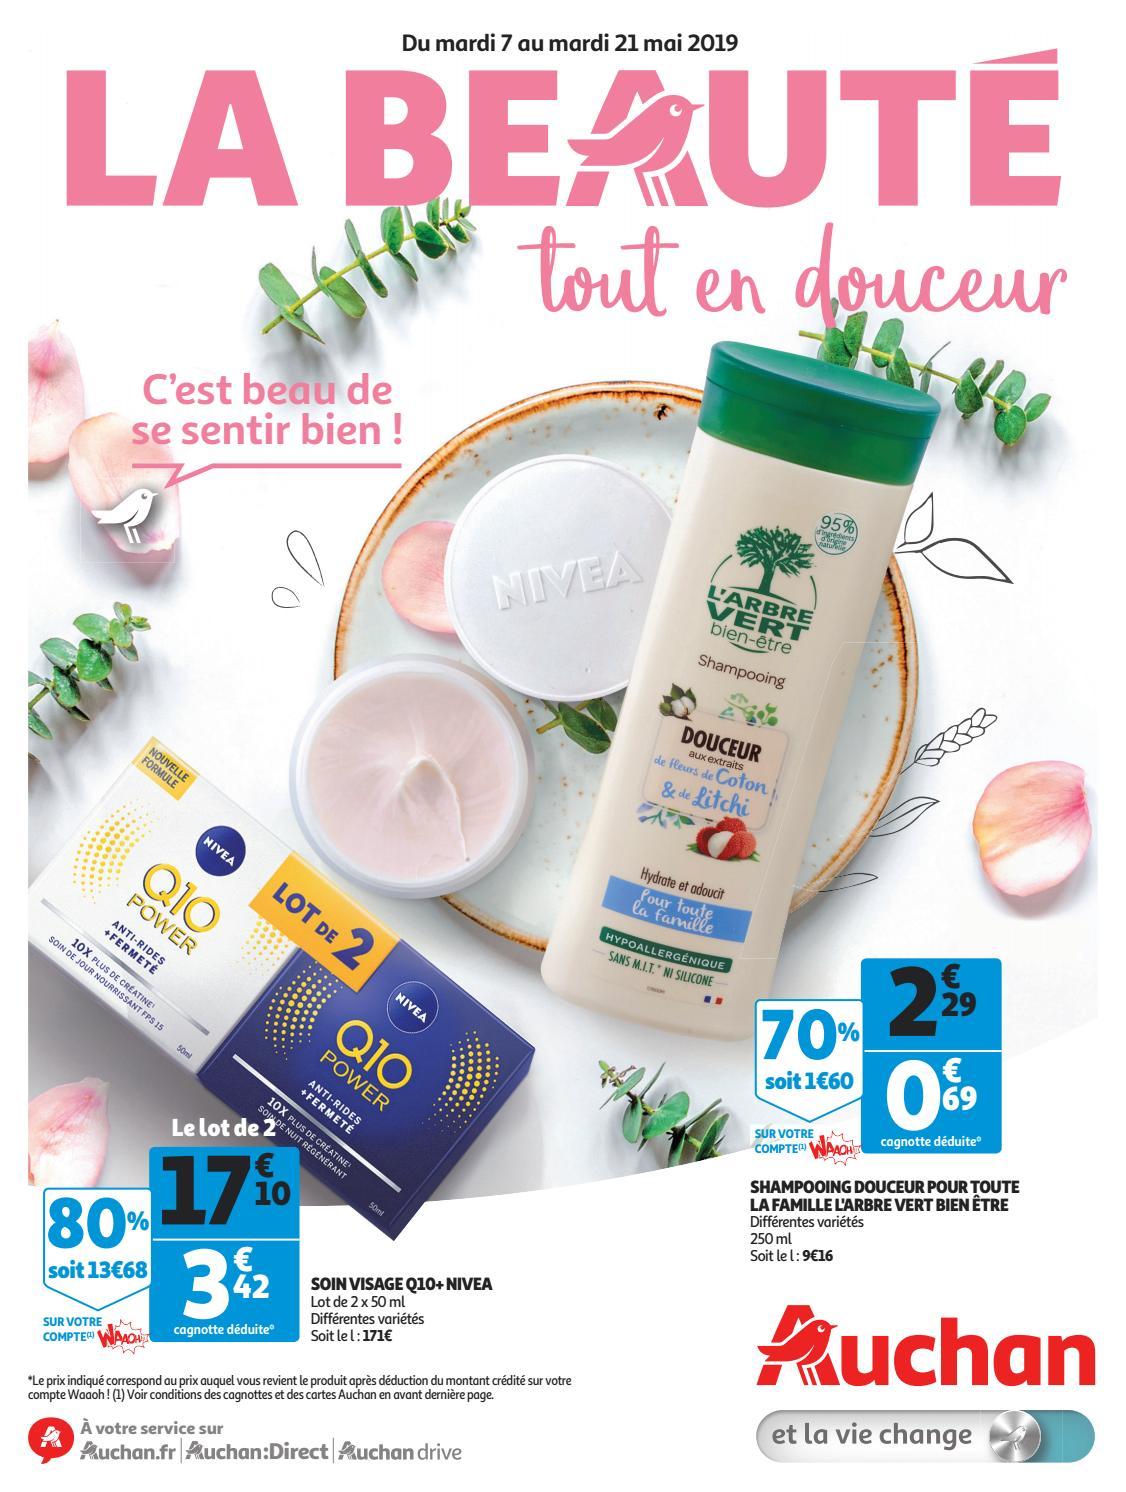 Carte Accord Auchan Compte Waaoh.Catalogue Auchan Du 7 Au 21 Mai 2019 By Monsieurechantillons